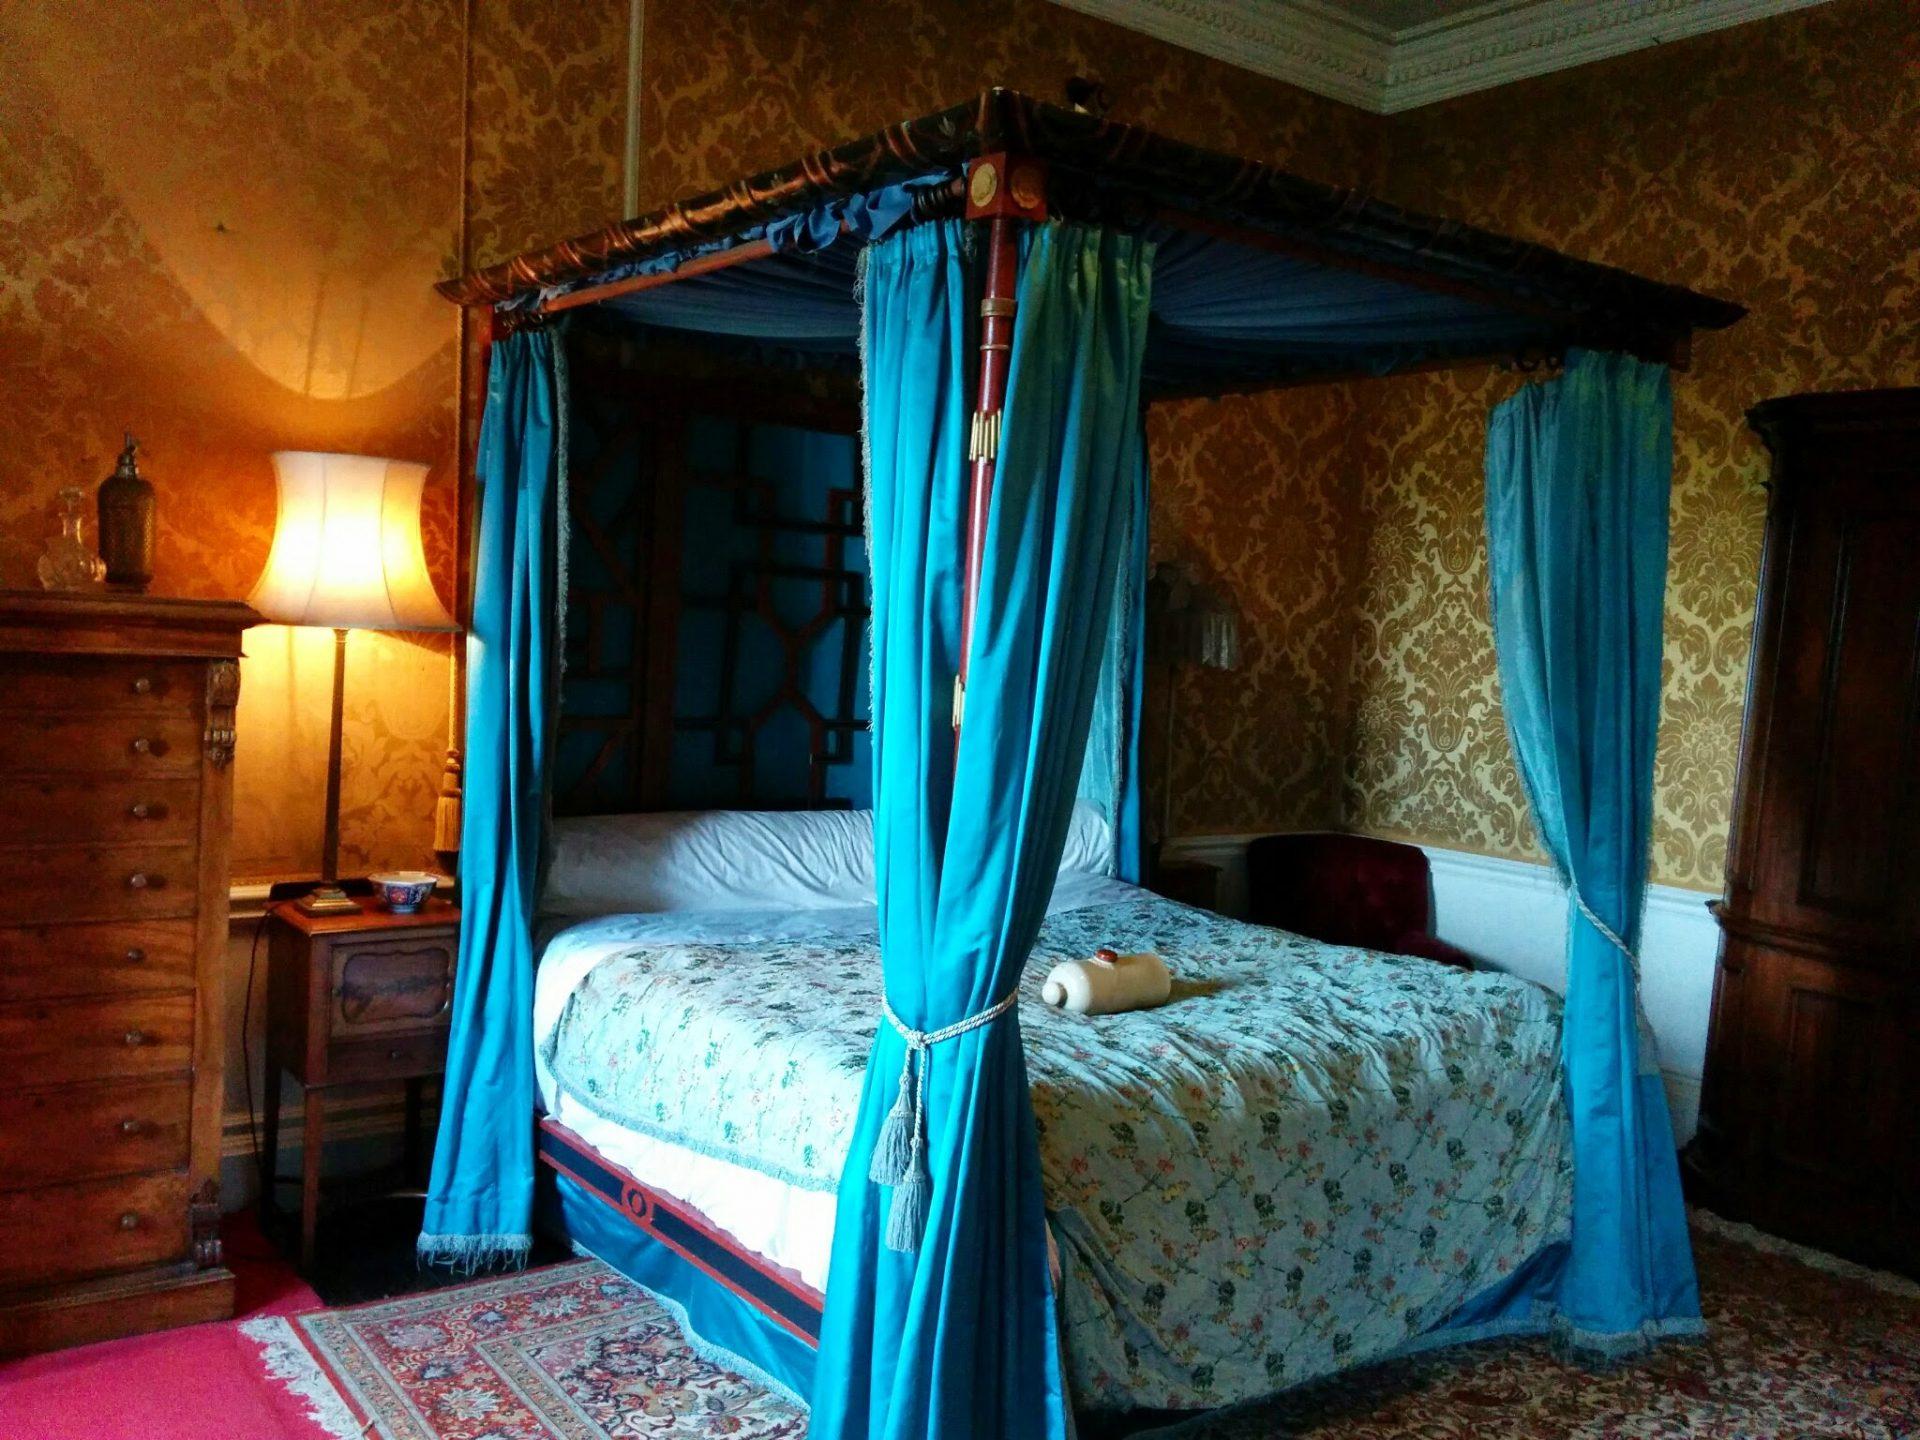 Bedroom at Warwick Castle